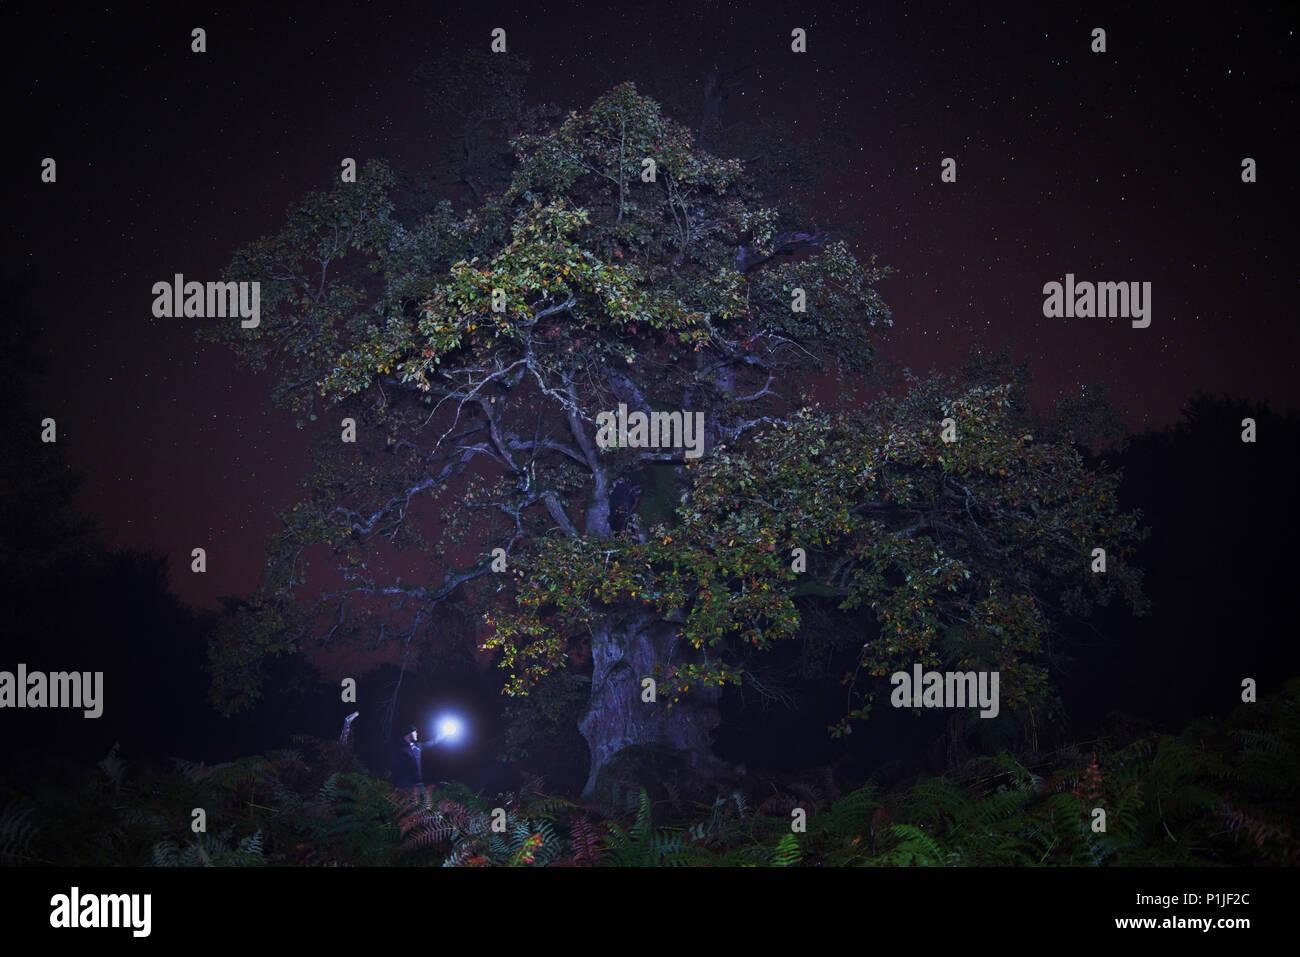 Mighty oak in Reinhardswald at night, Sabawald, Hesse, Germany - Stock Image